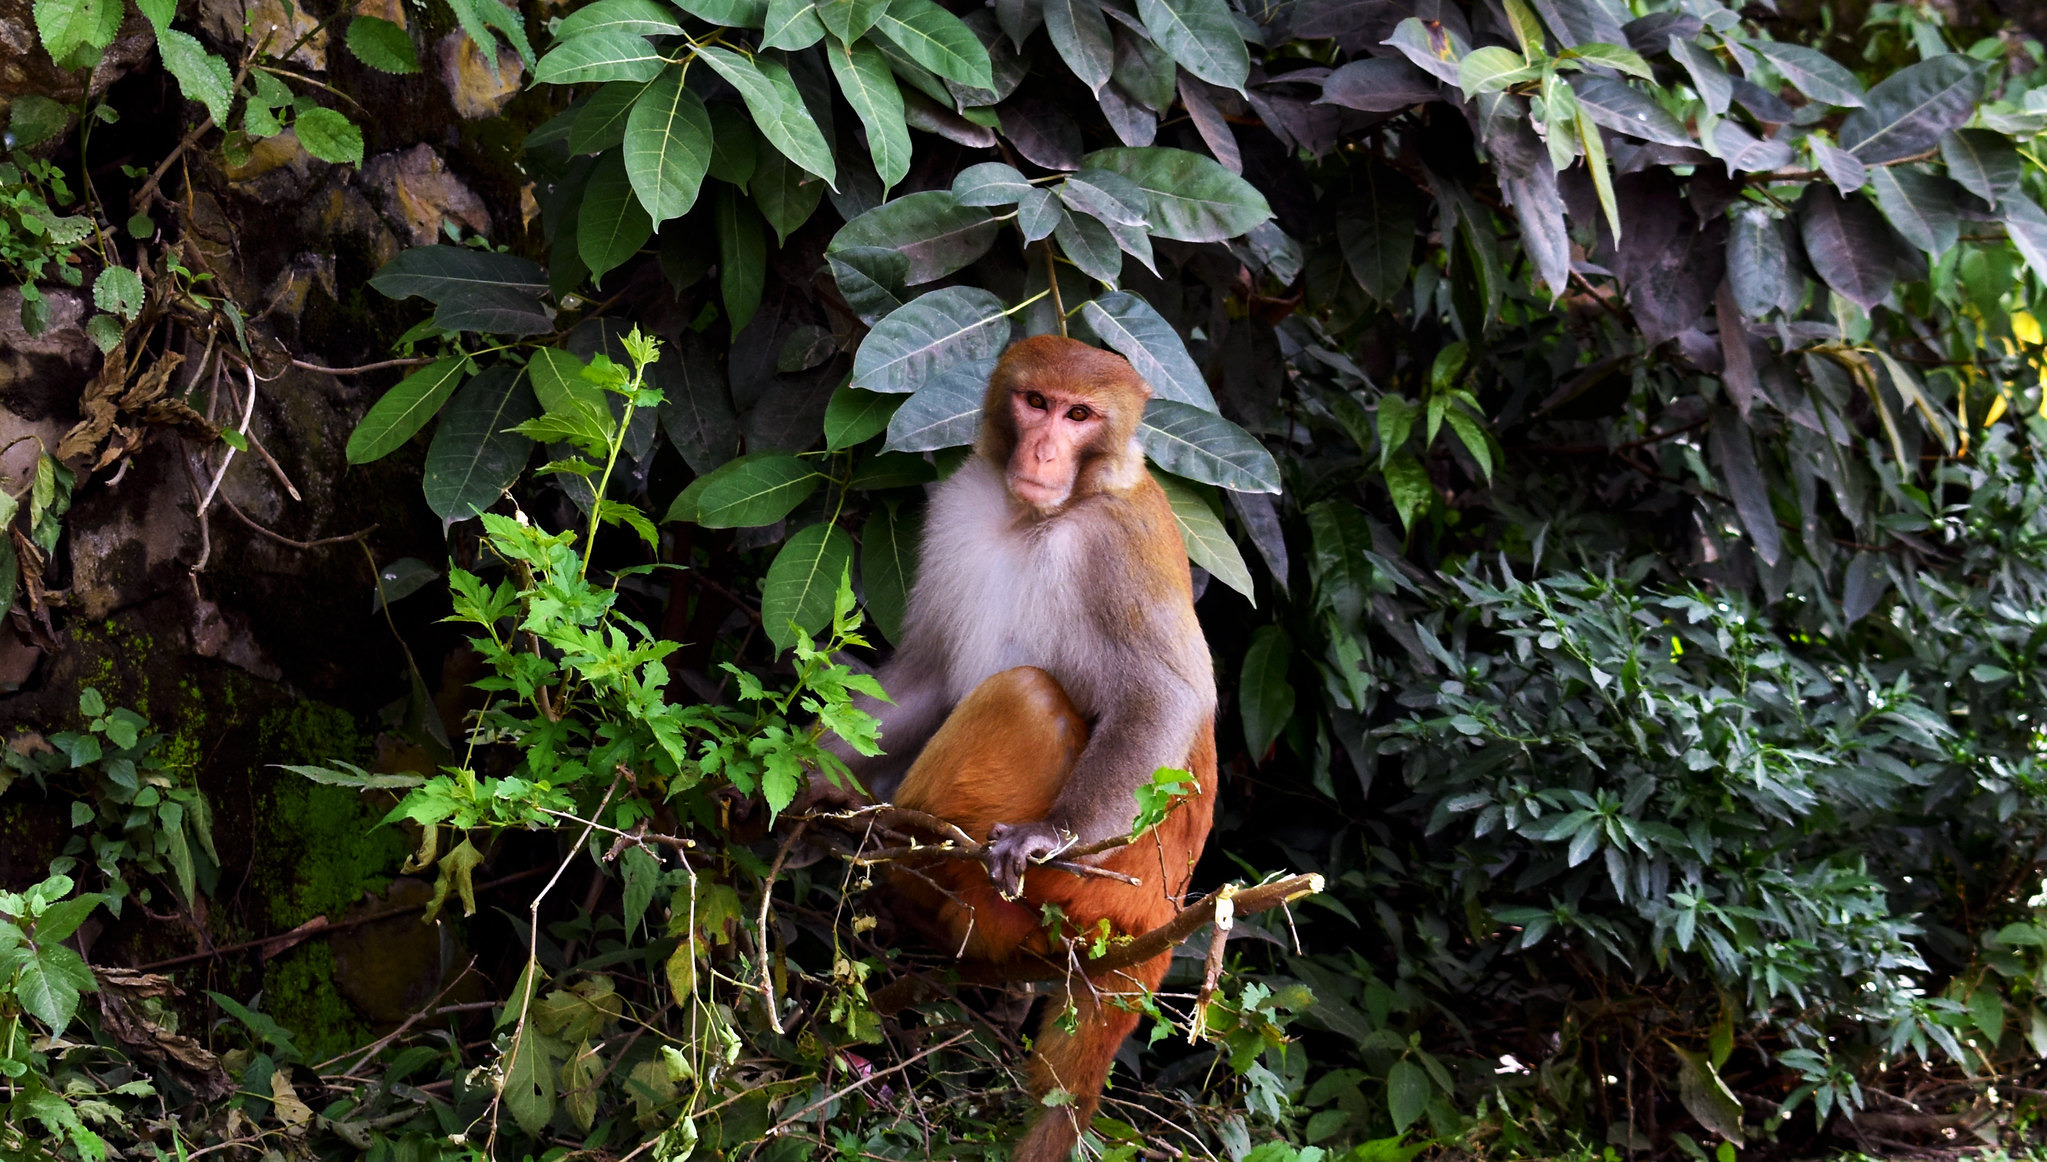 A monkey at Swayambhunath Temple, Kathmandu. Photo: Stig Berge/Flickr